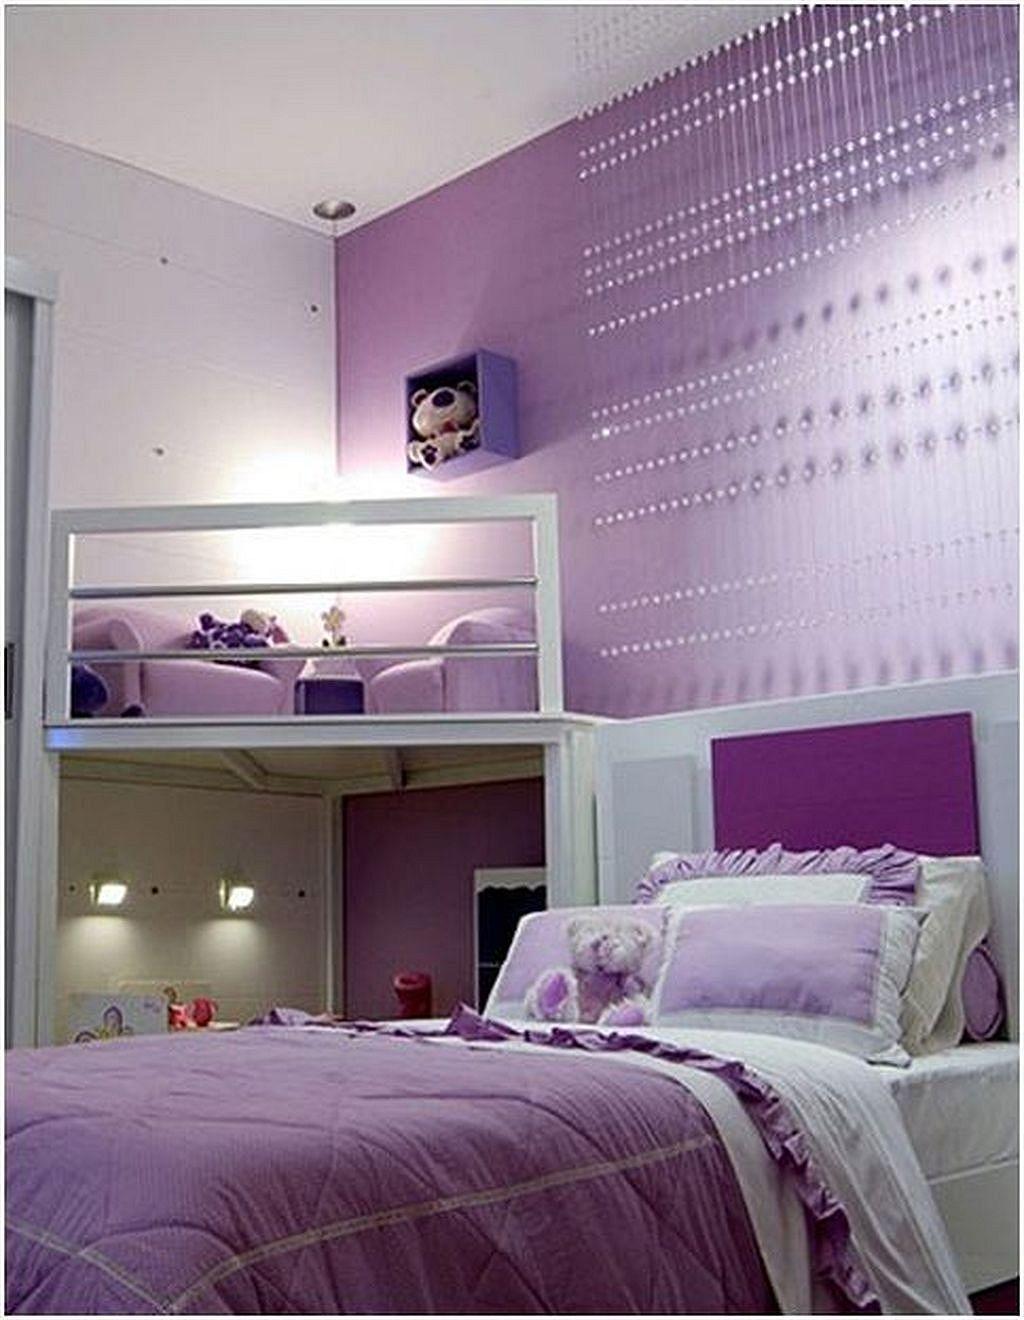 40  Gorgeous Teen Girl Bedroom Theme Ideas. 40  Gorgeous Teen Girl Bedroom Theme Ideas   Gorgeous teen